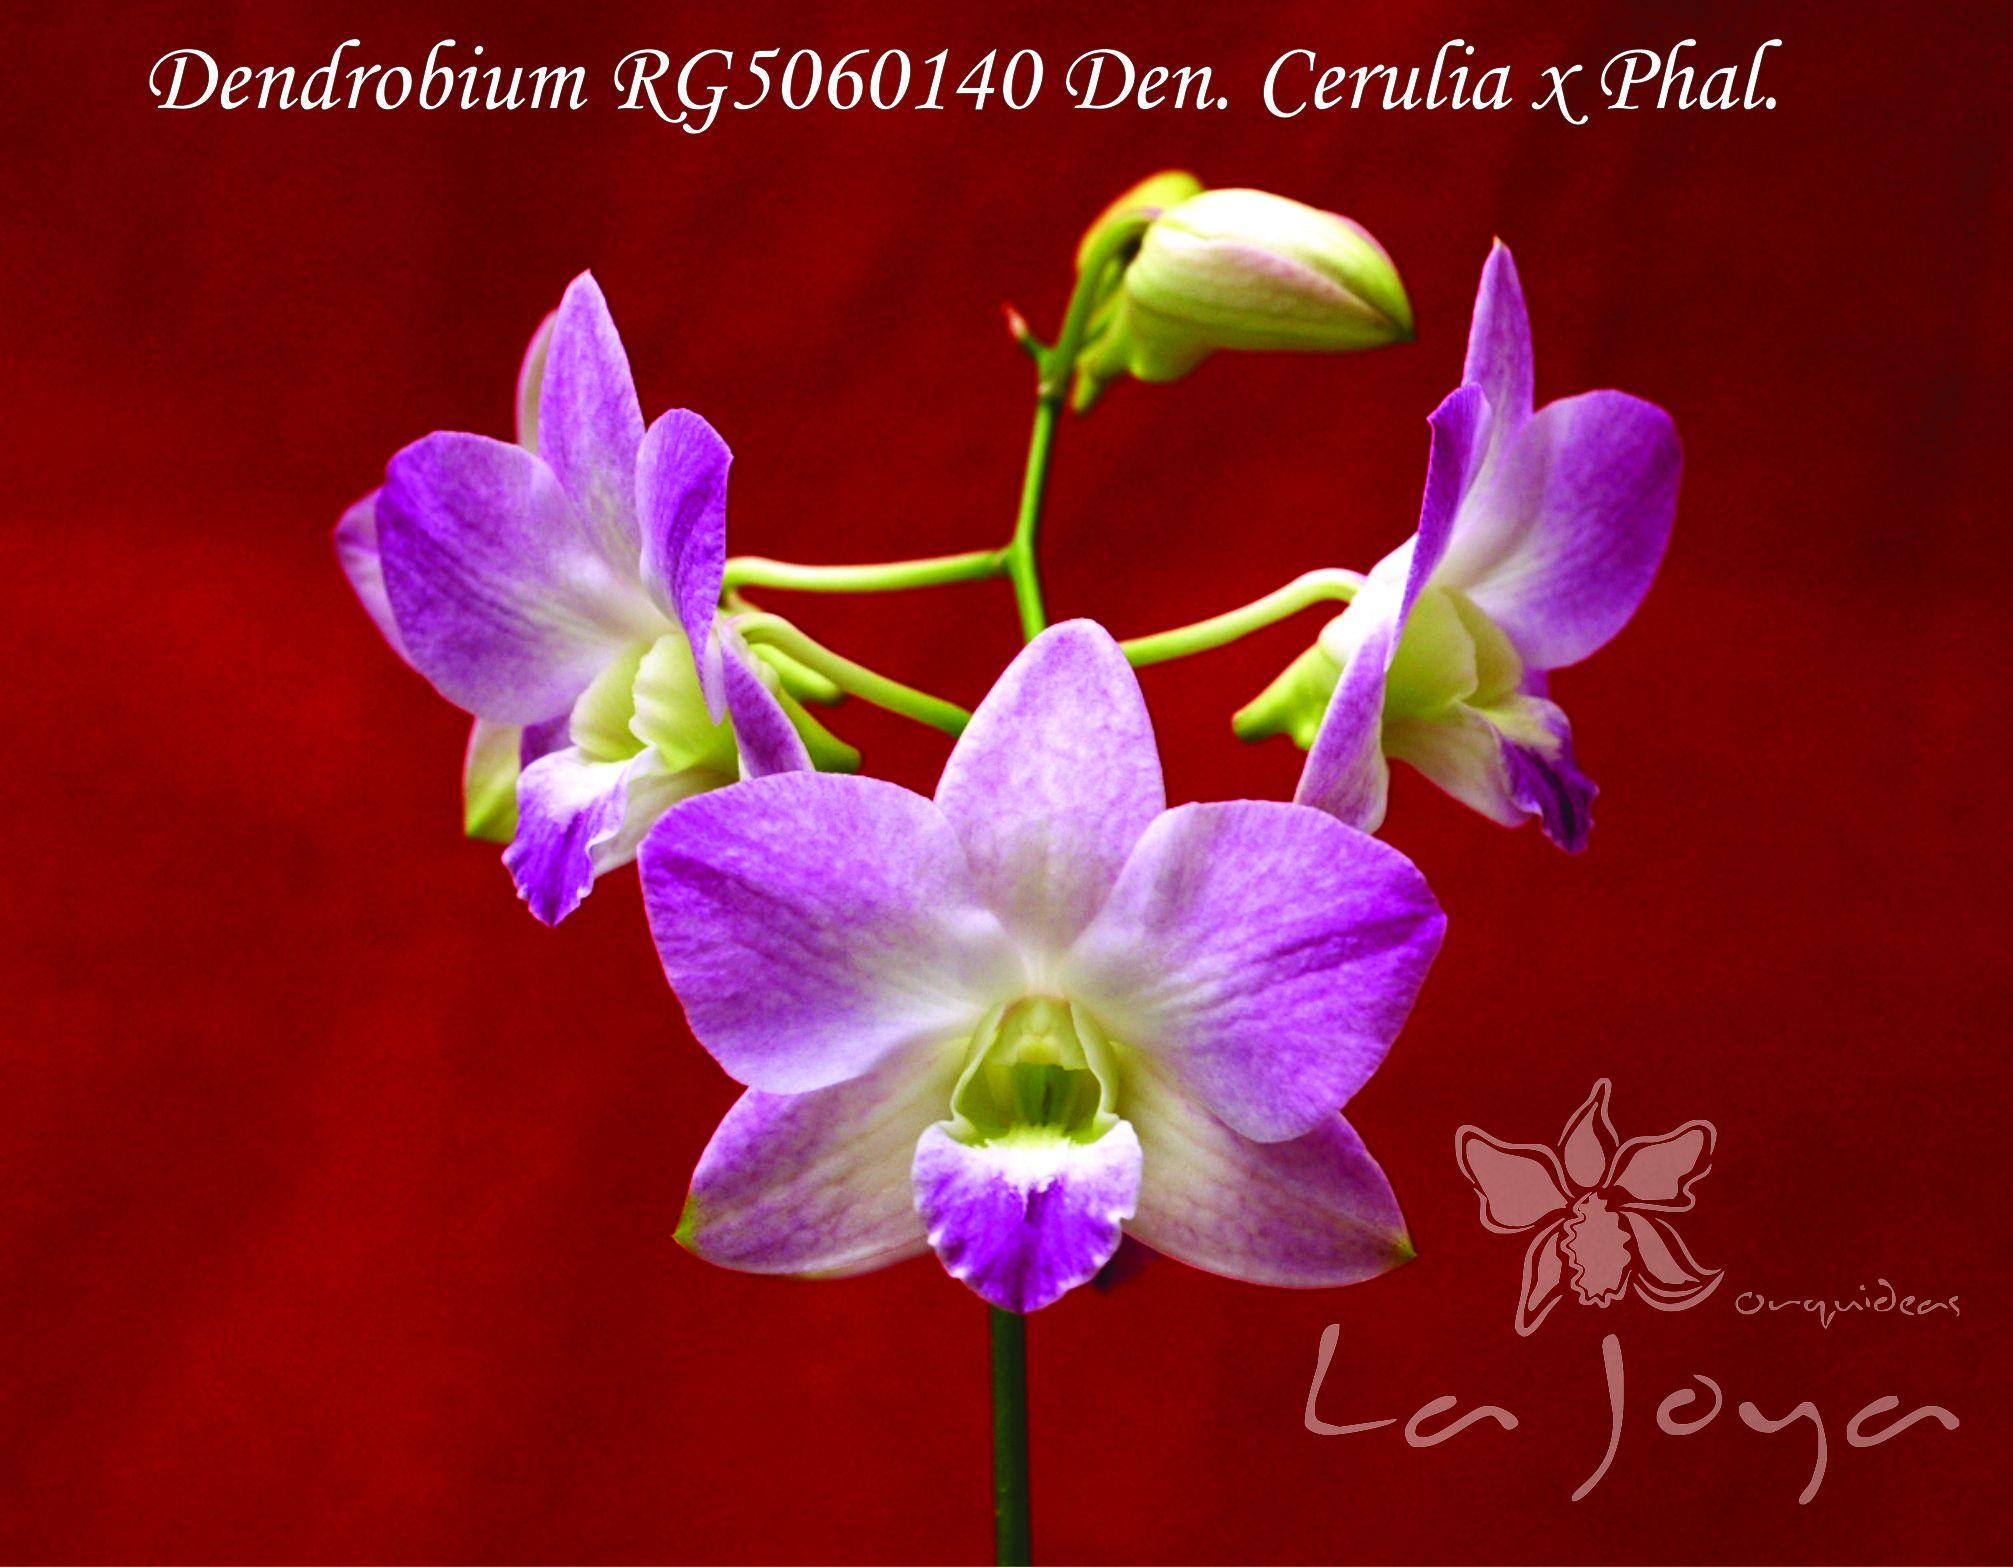 RG5060140 Den Cerulia x Phal